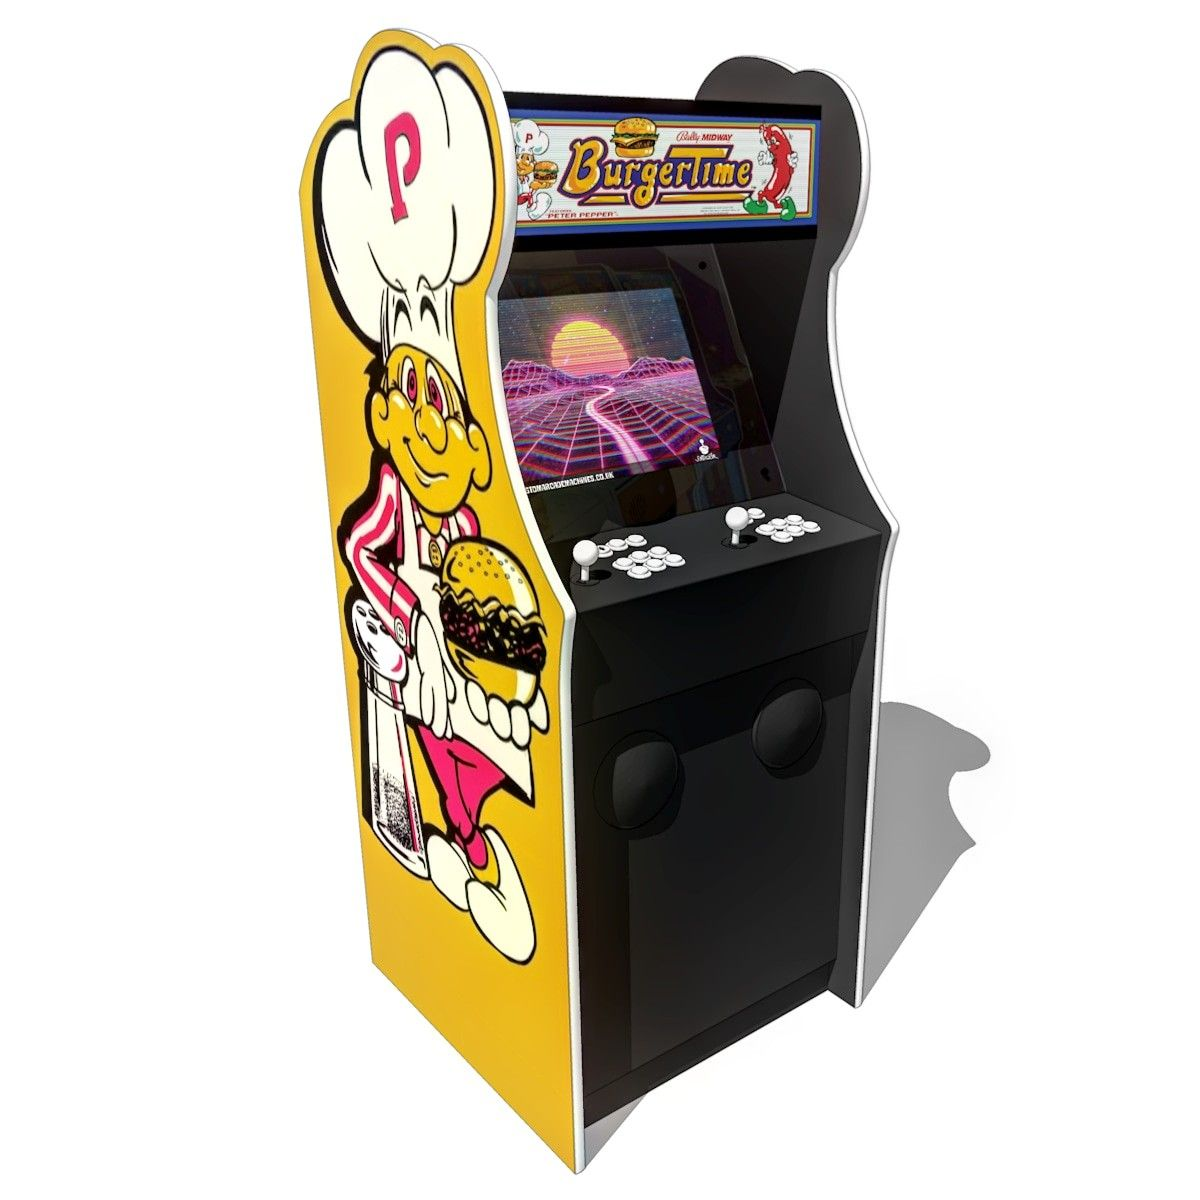 My Burger Time replica multi game arcade machine for